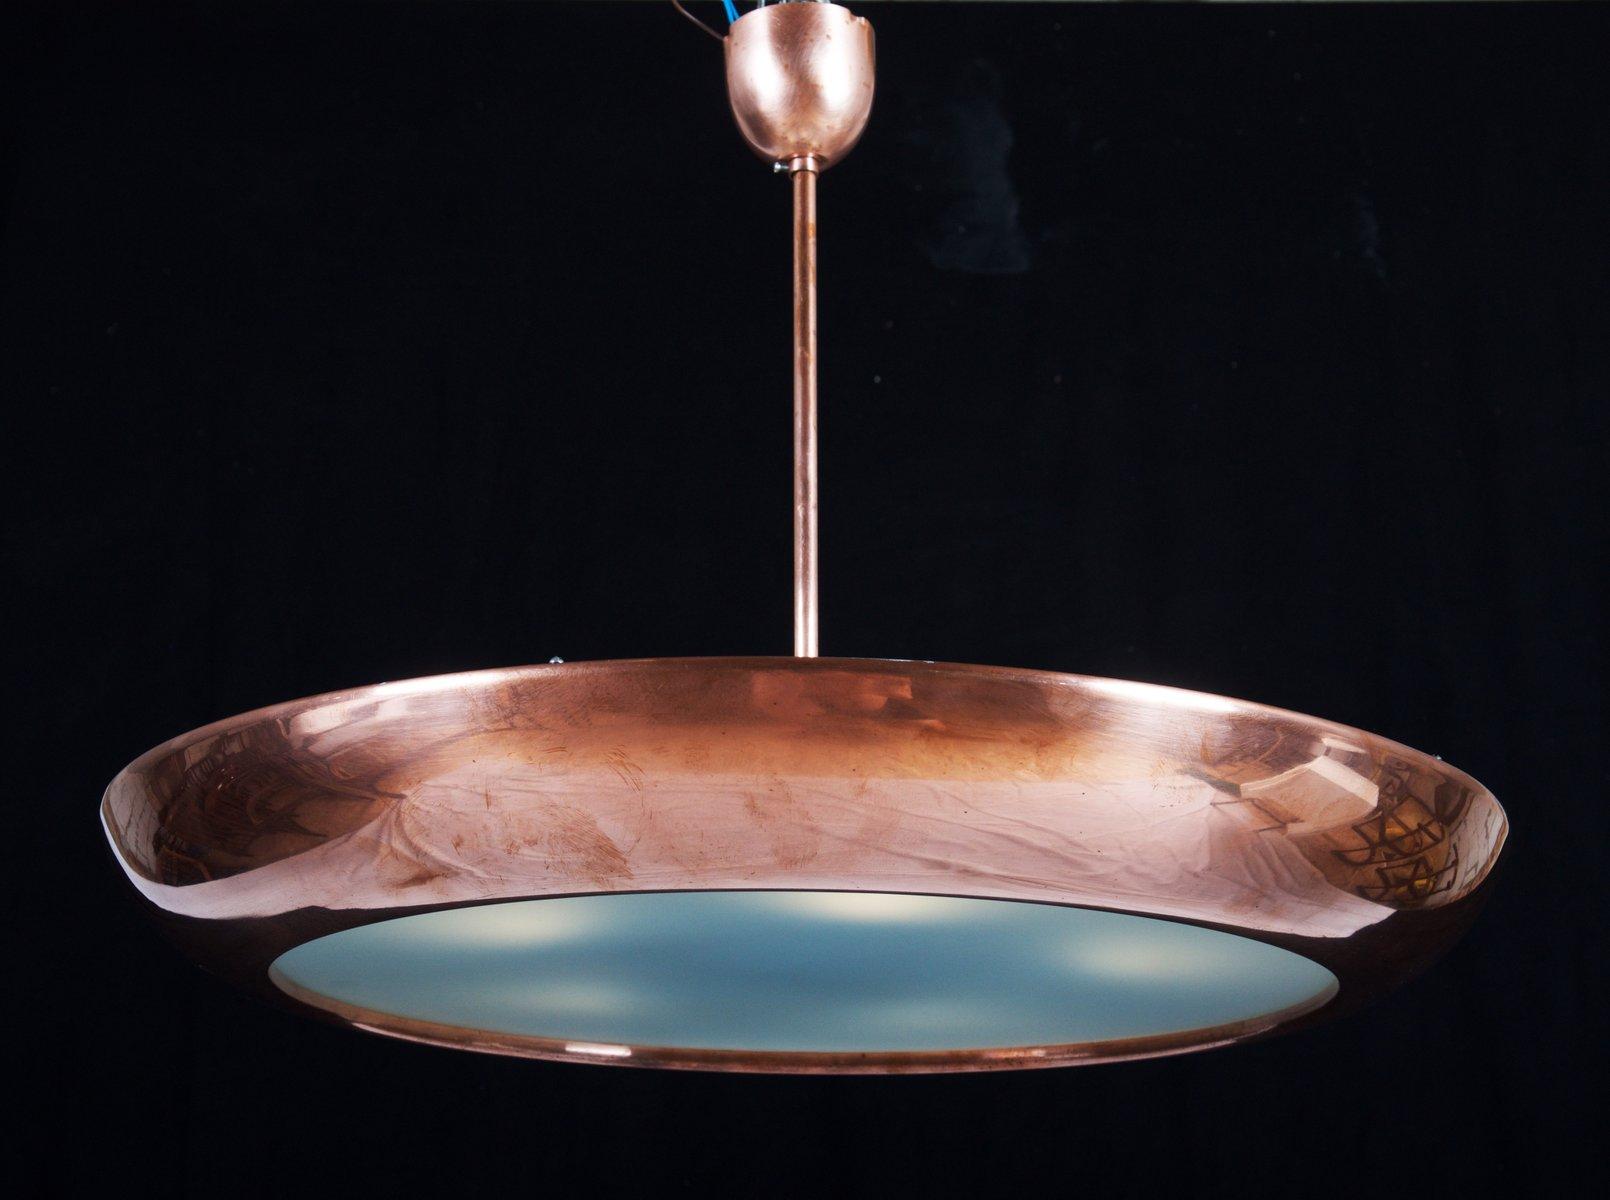 Large bauhaus copper pendant light by franta anyz for napako for large bauhaus copper pendant light by franta anyz for napako arubaitofo Choice Image